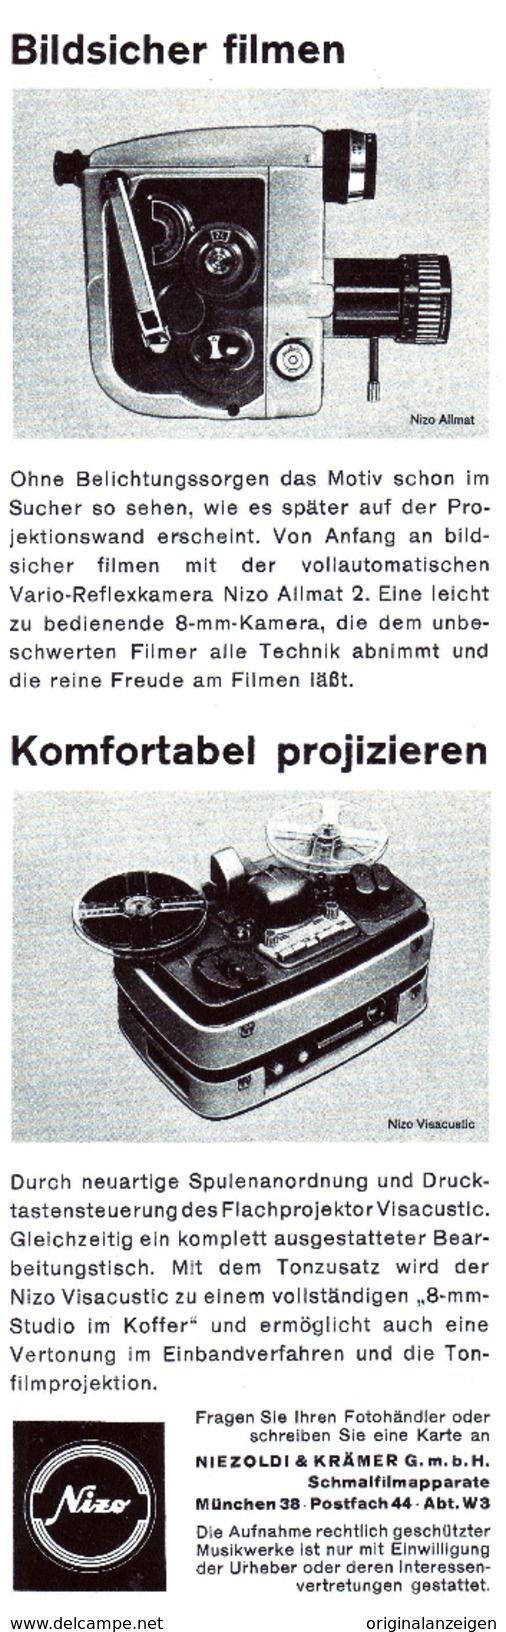 Werbung - Original-Werbung/Anzeige 1962 - NIZO ALLMAT 2 - 8-mm-FILMKAMERA - ca. 65 x 220 mm